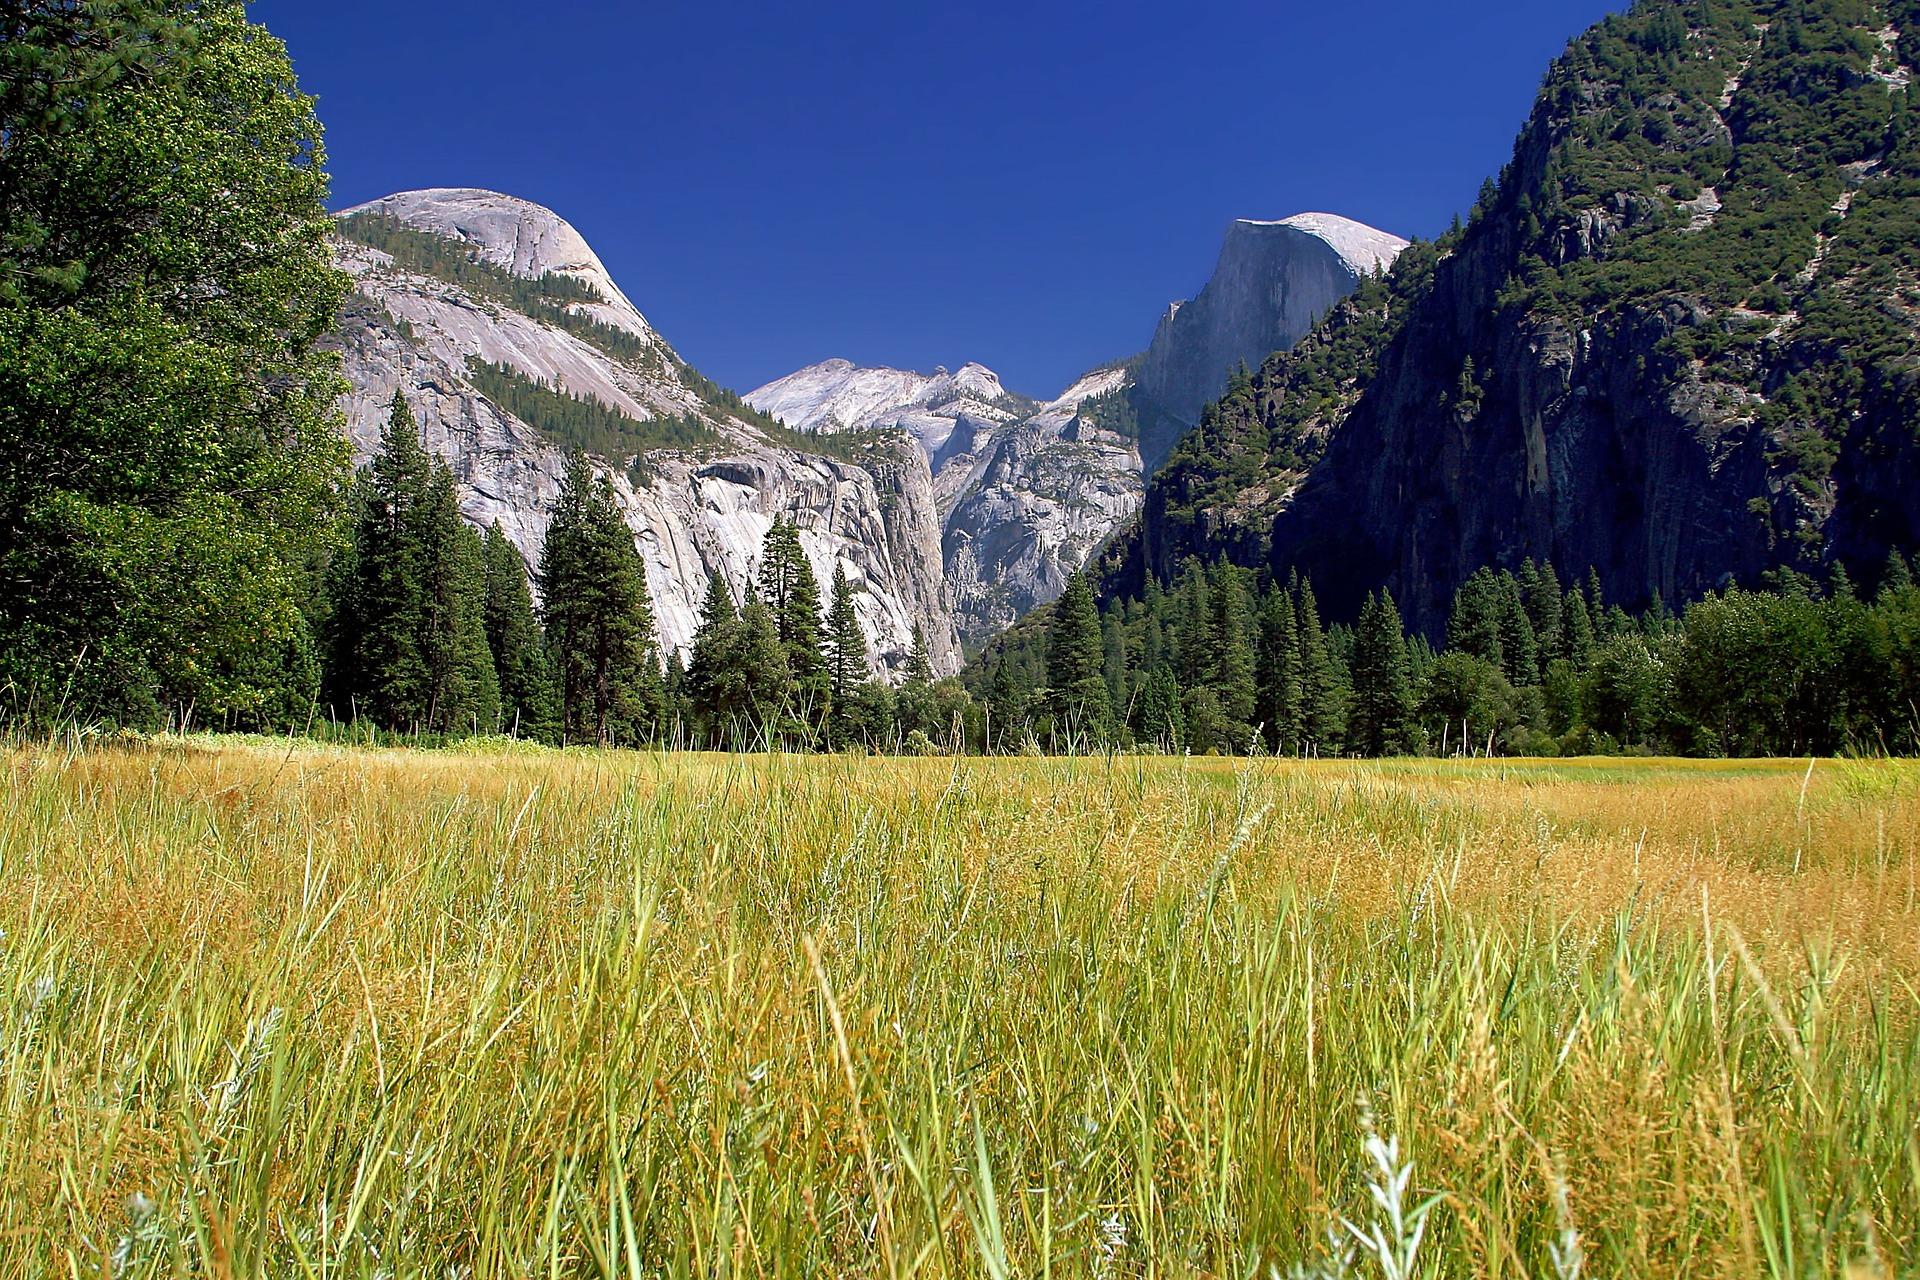 Yosemite National Park Meadow